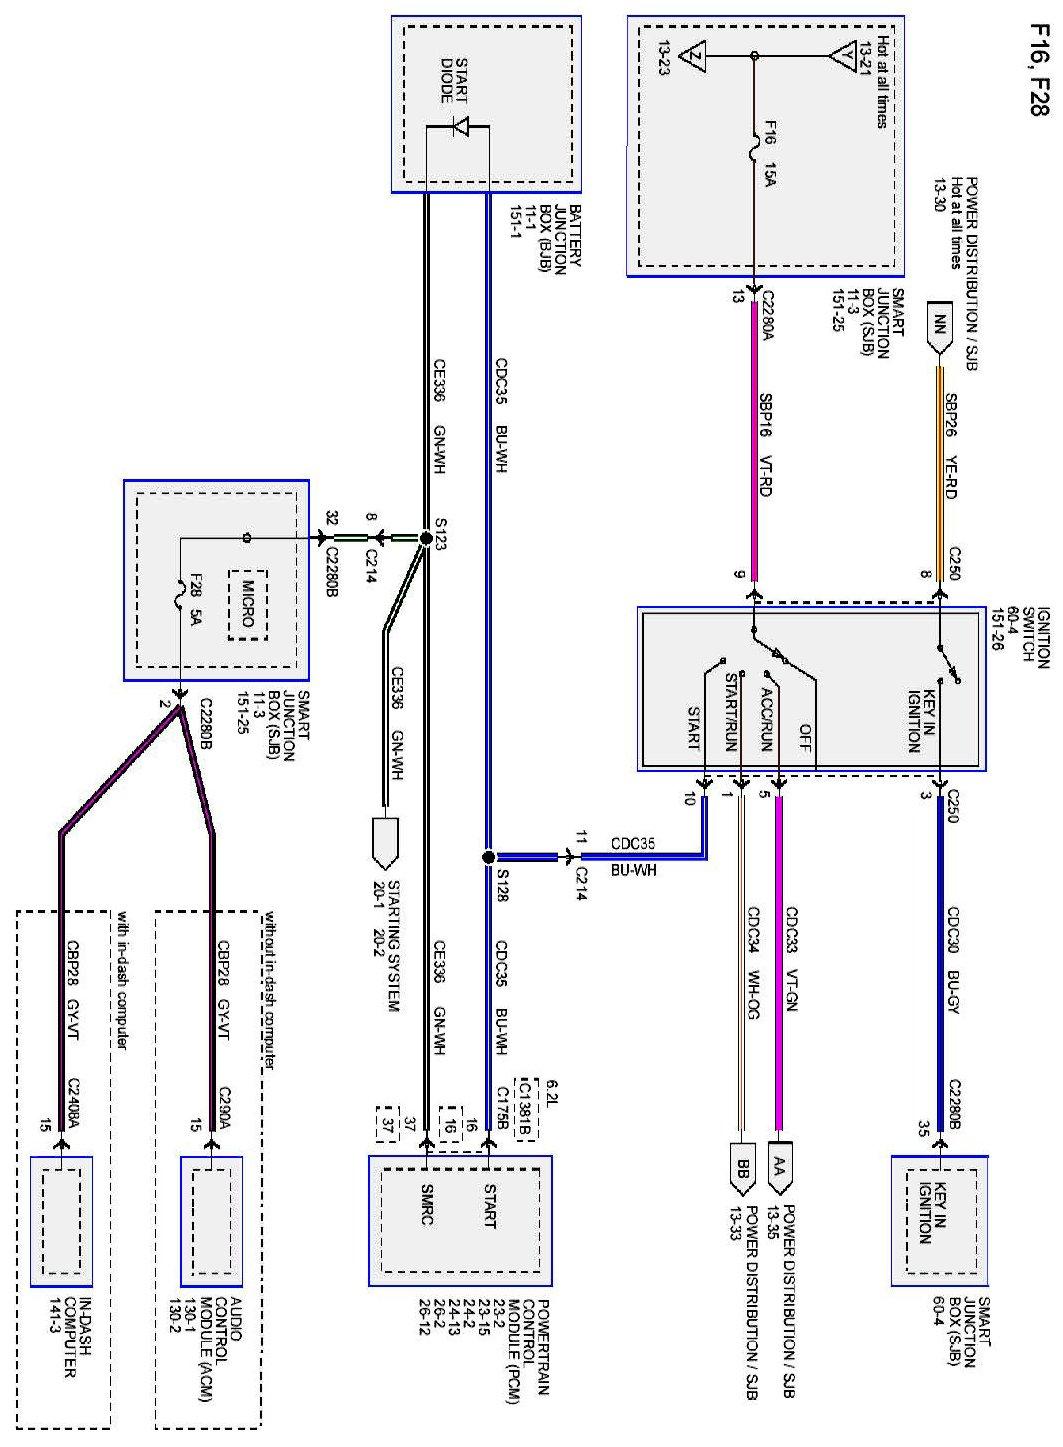 b7e6470a-c883-407f-bef8-3d7fa5d57eb2_ignition switch.jpg